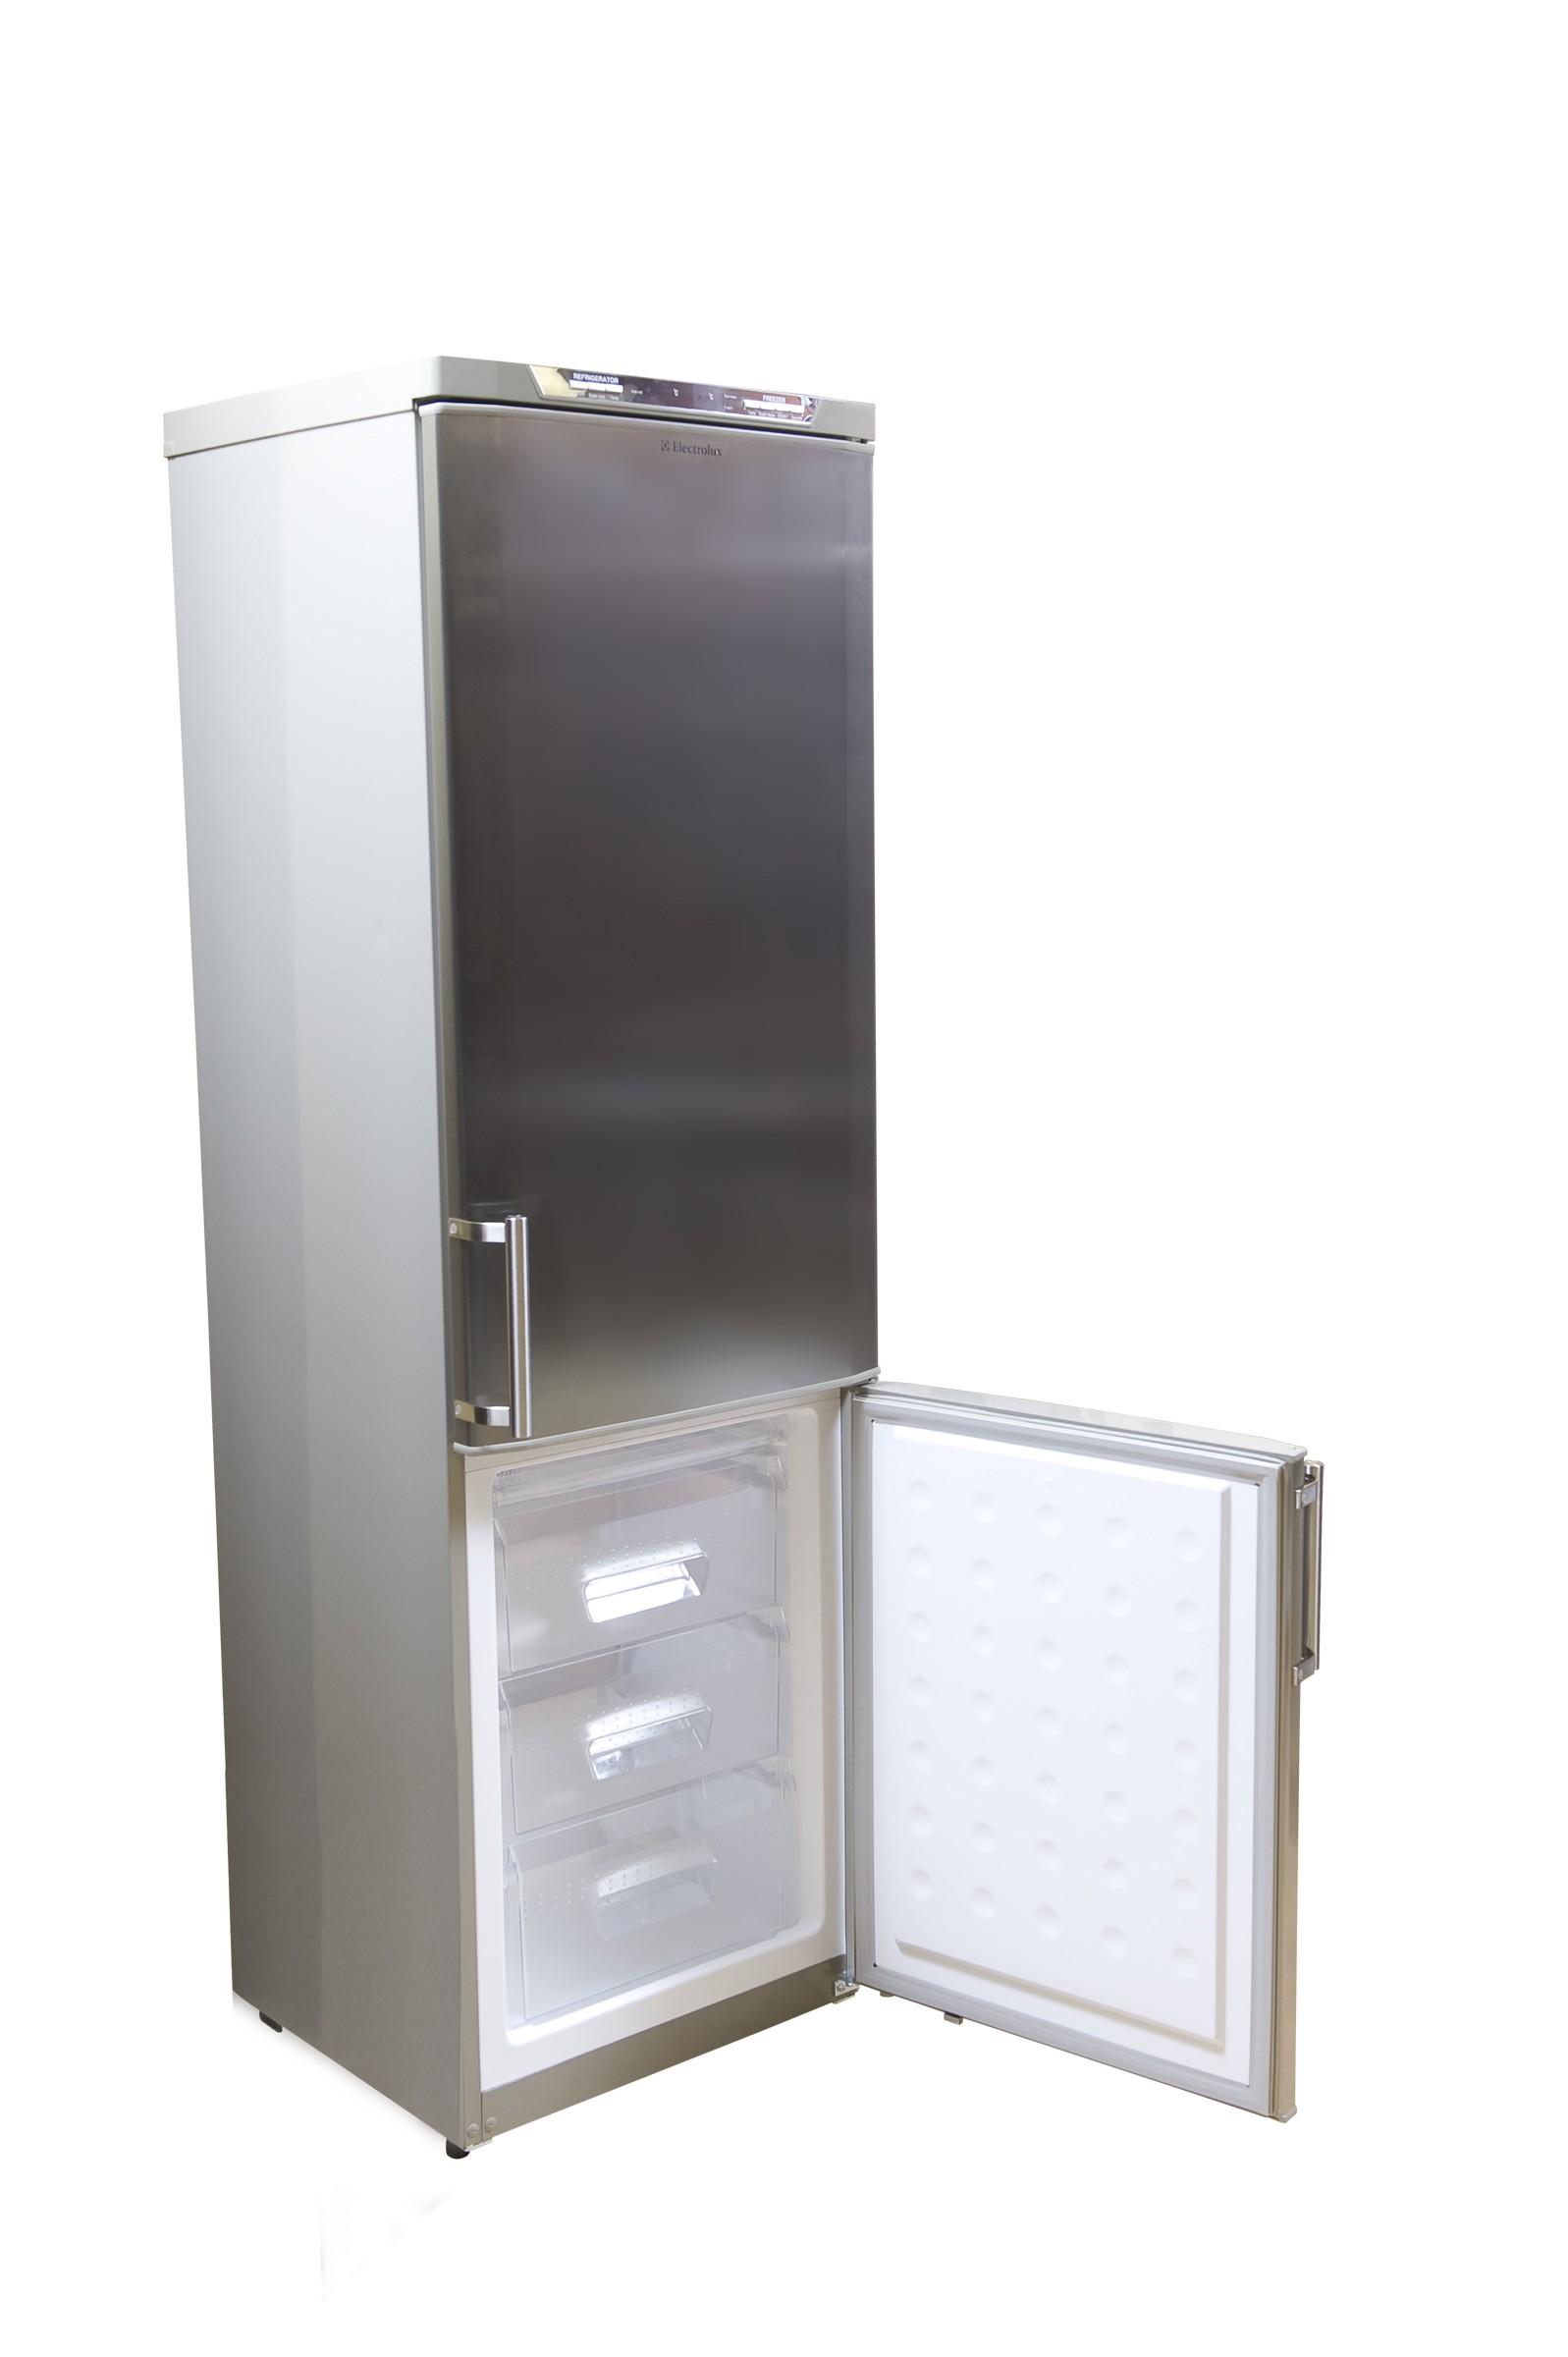 Ei11bf25ls Electrolux Refrigerator Canada Best Price